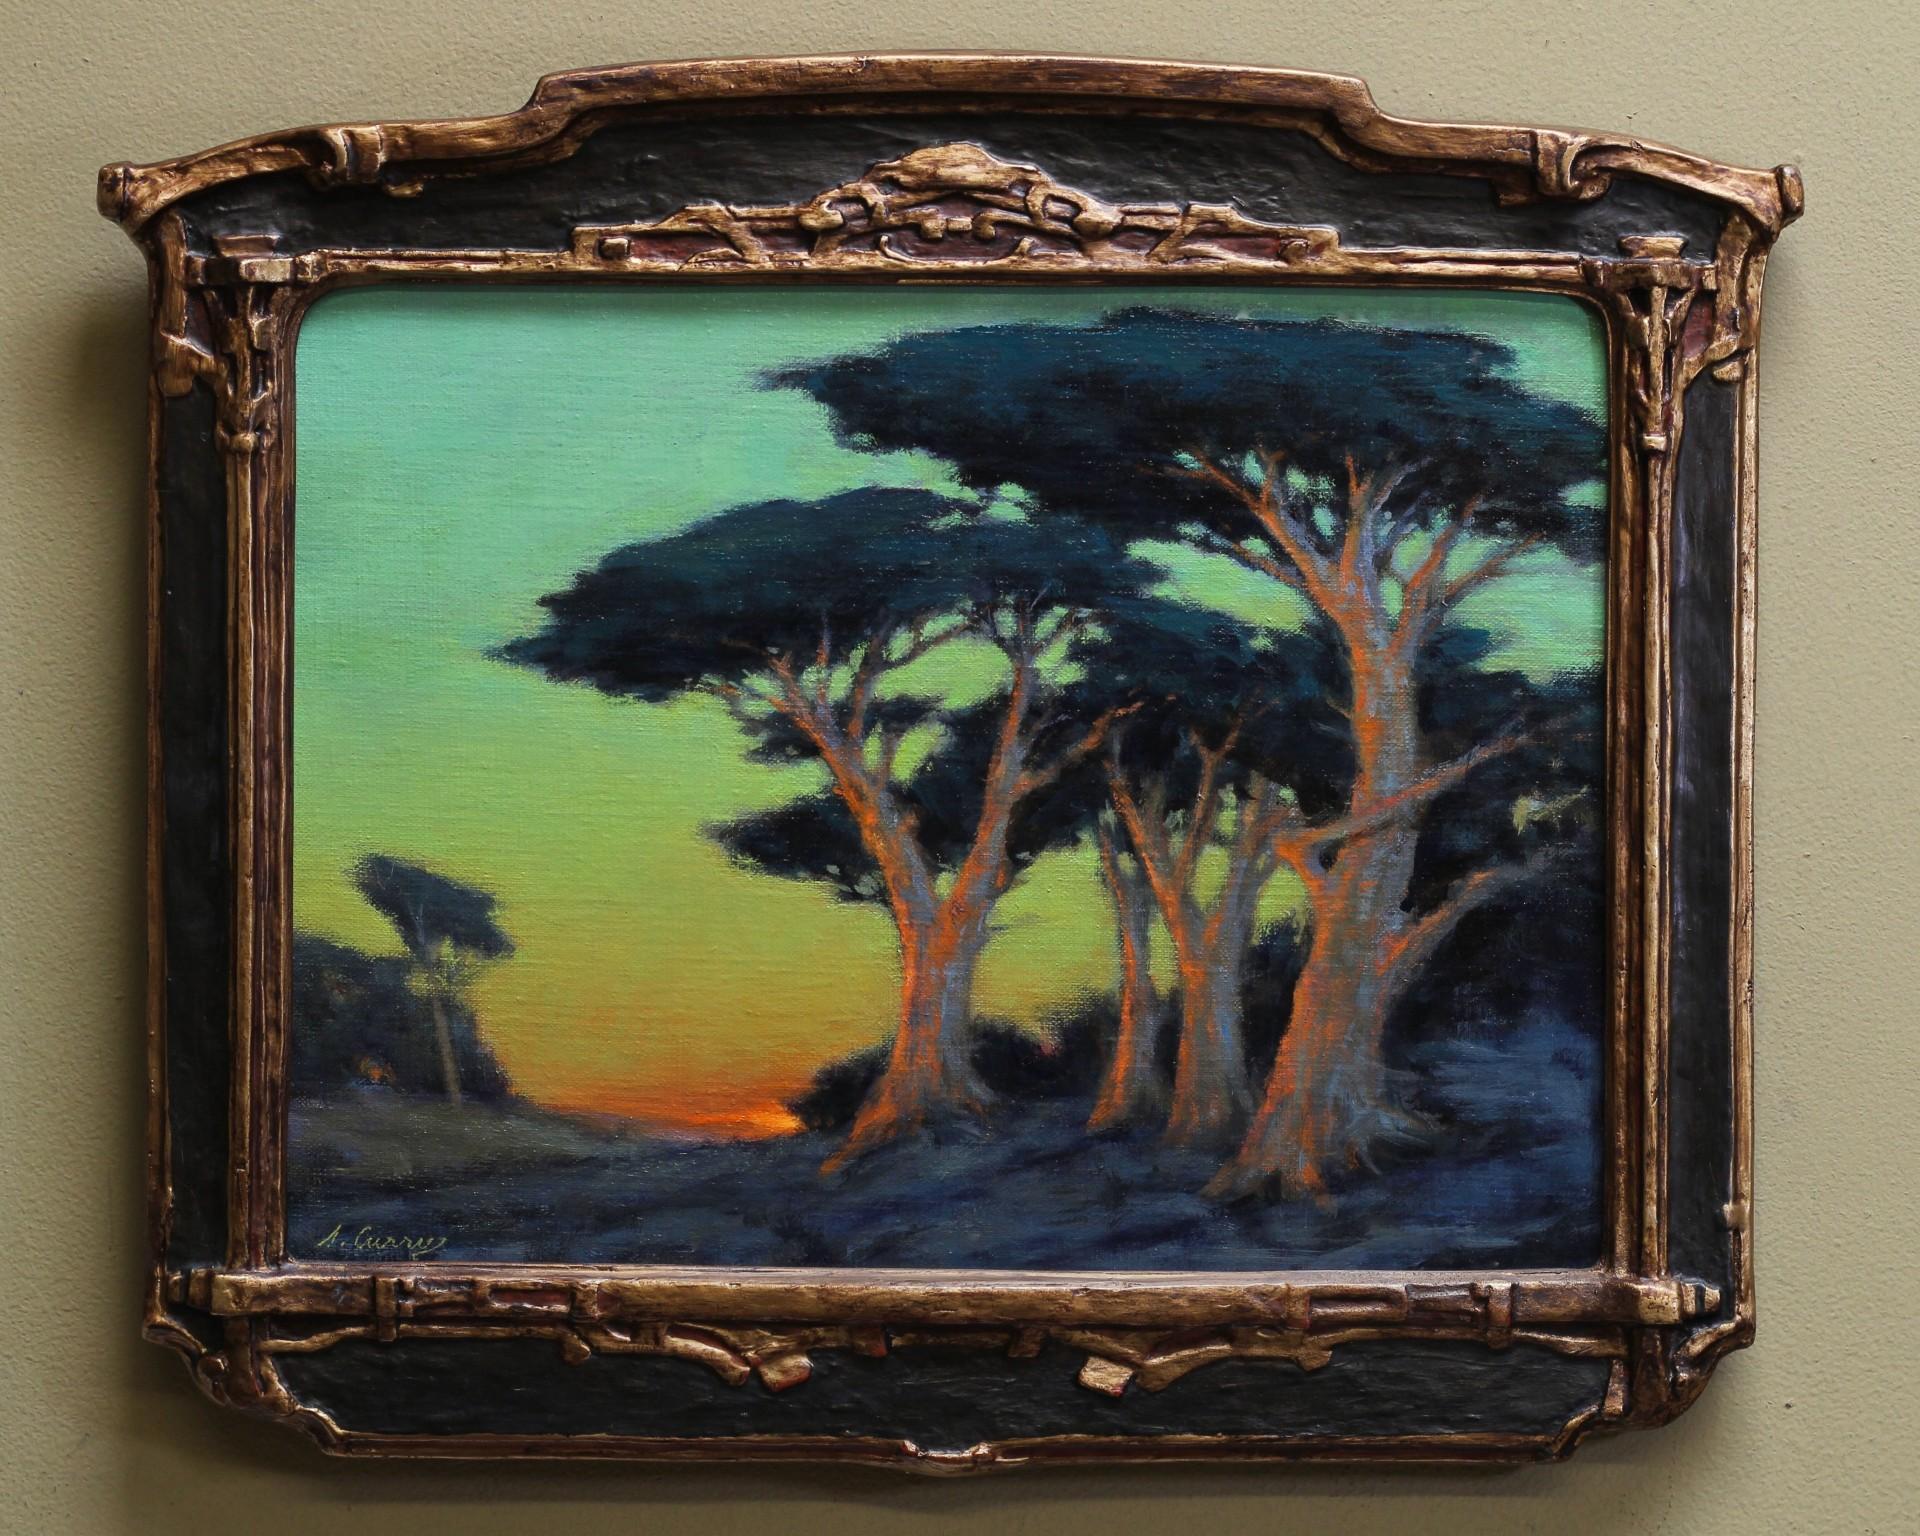 Steven Curry | Emerald Eve | 12 x 16 | Oil